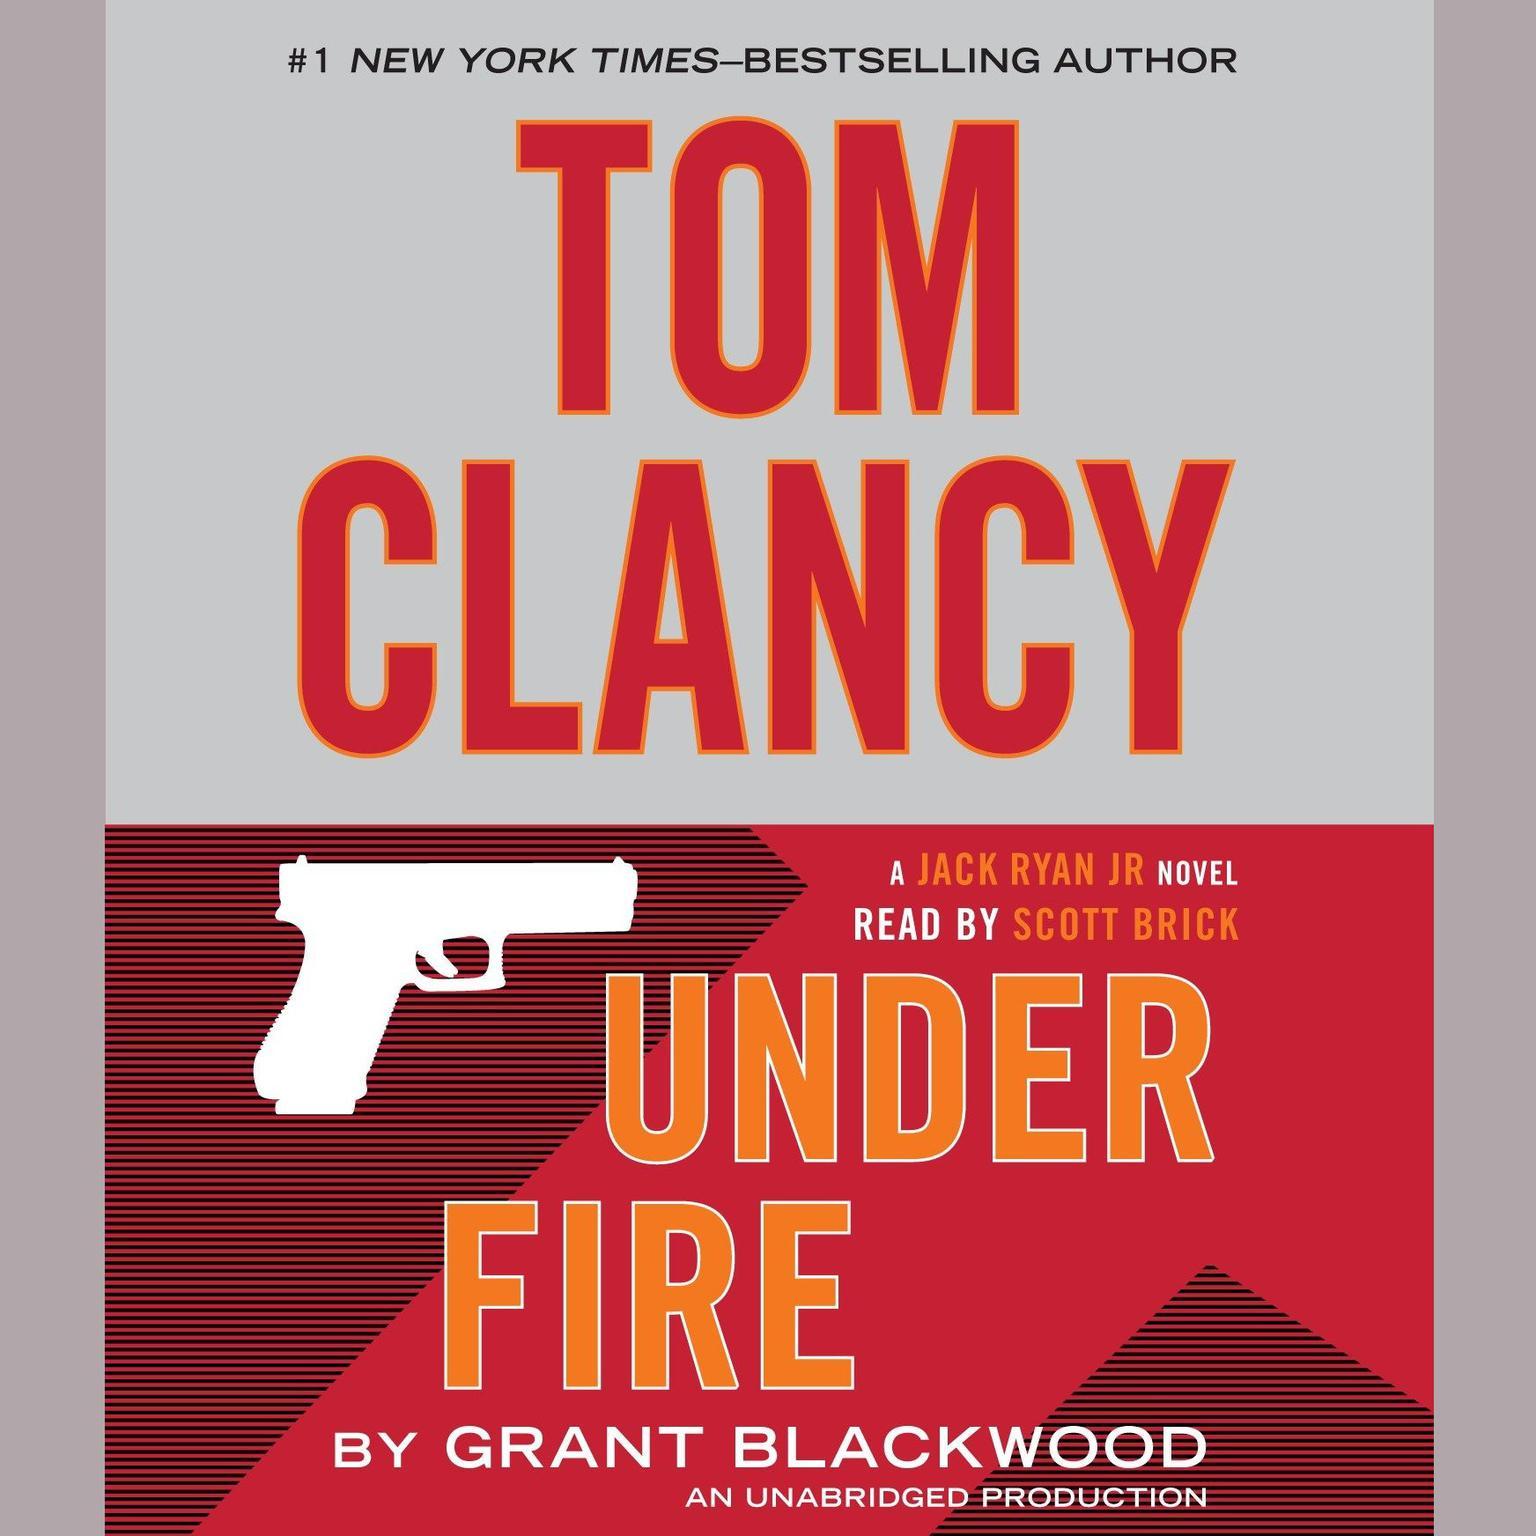 Printable Tom Clancy Under Fire: A Jack Ryan Jr. Novel Audiobook Cover Art